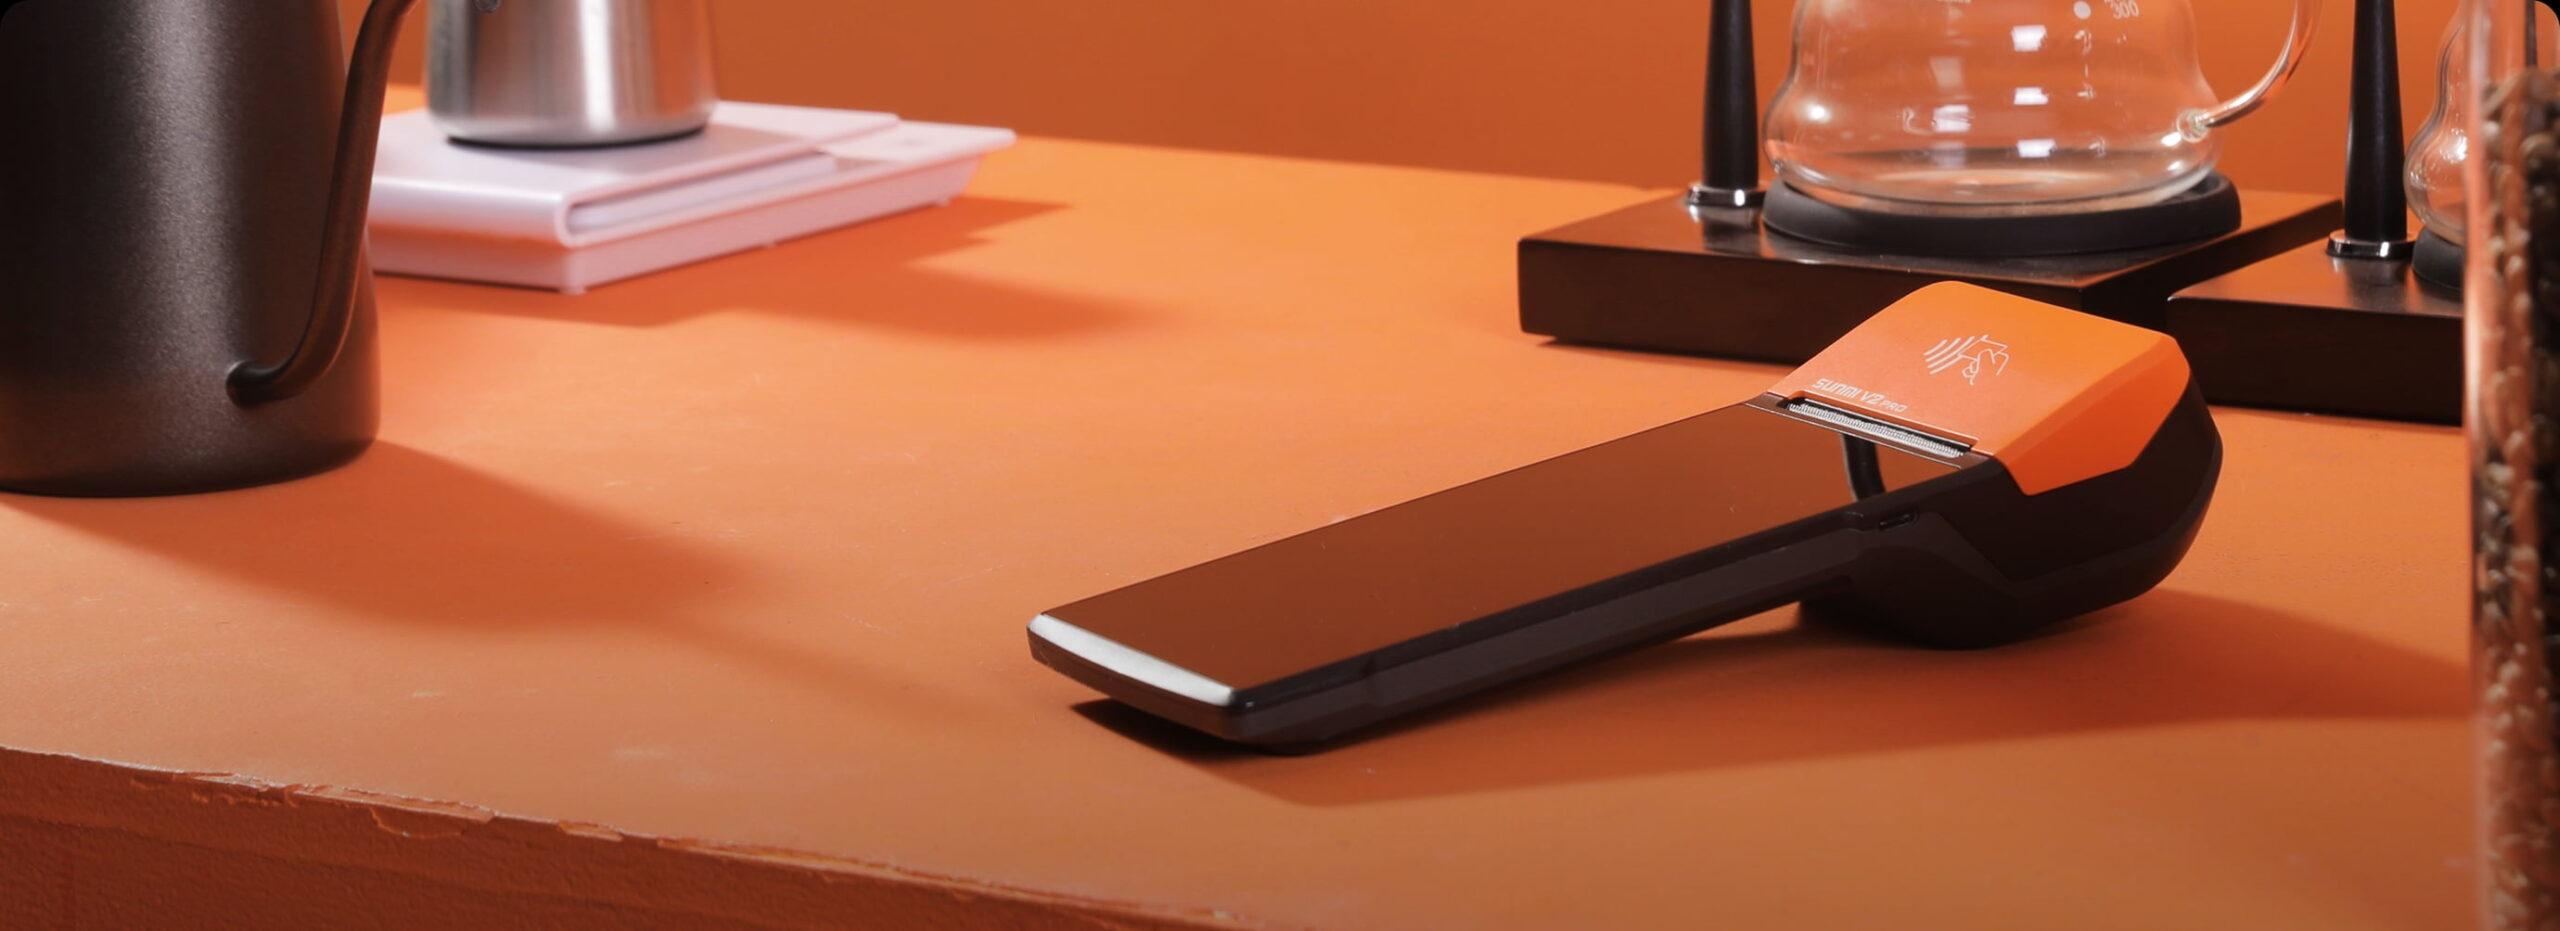 Sunmi V2 Pro Mobile POS Android 4G Handheld NFC เครื่องขายหน้าร้าน เครื่องรับออเดอร์